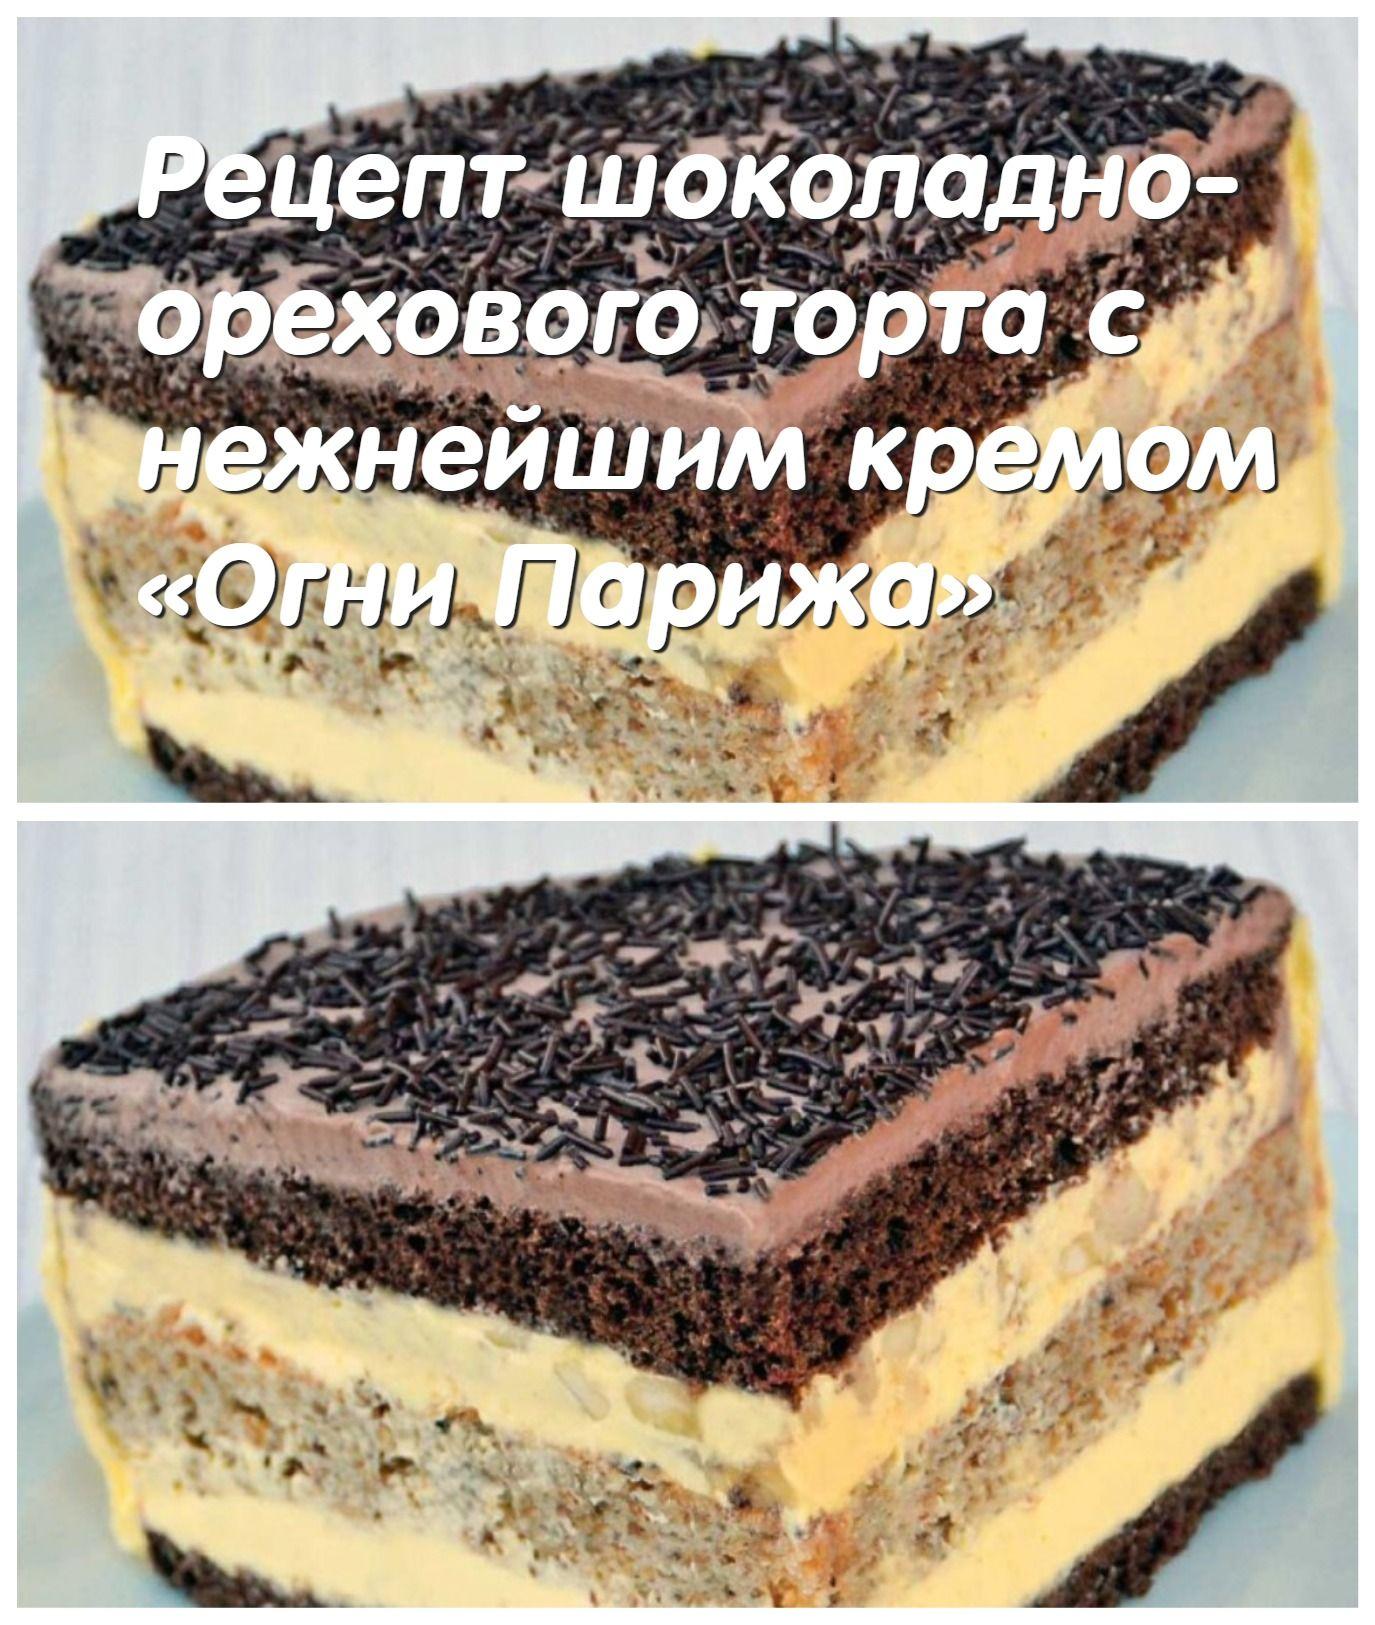 Photo of Рецепт шоколадно-орехового торта с нежнейшим кремом «Огни Па…